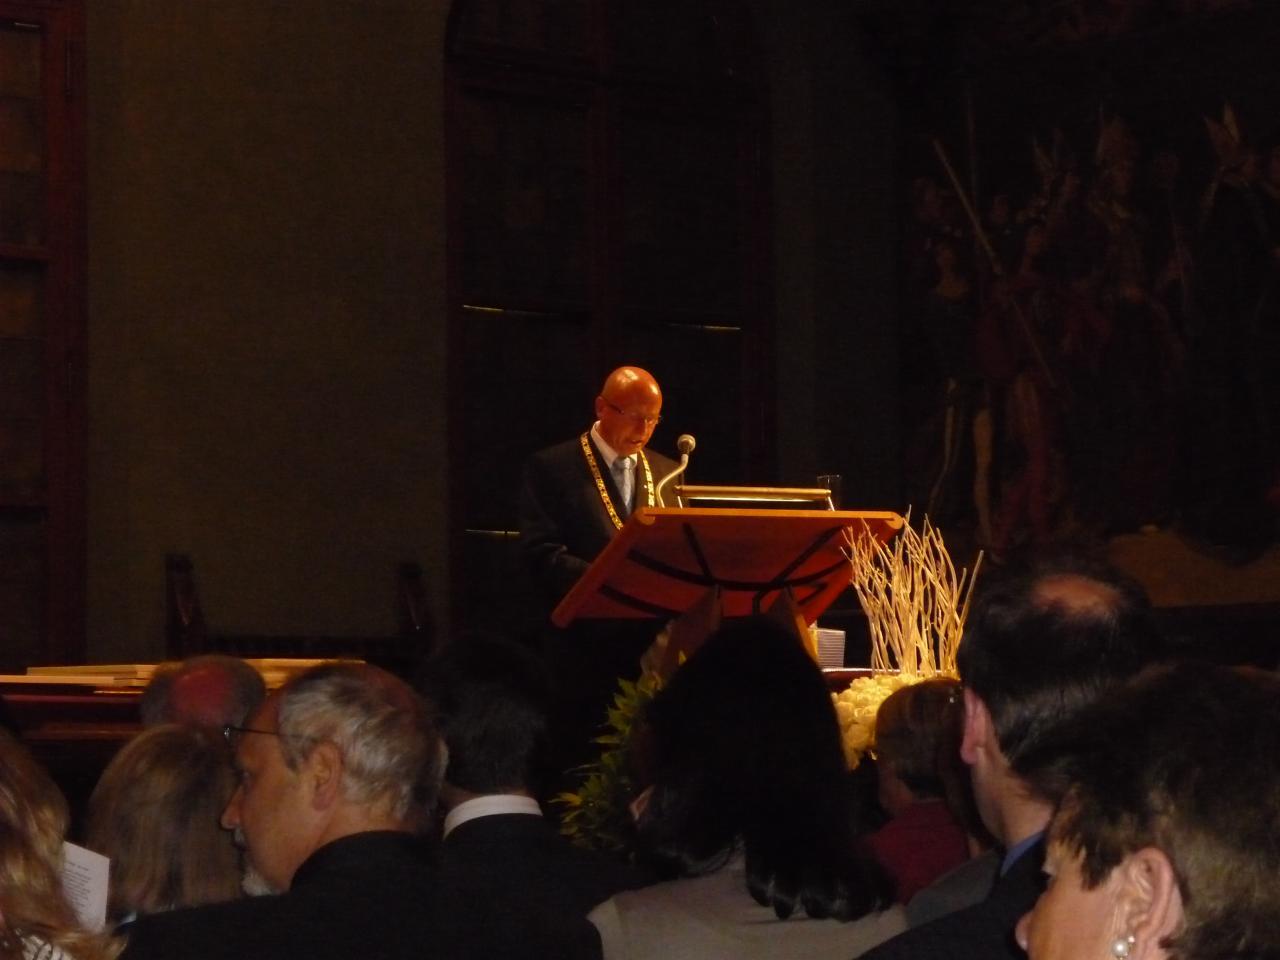 Discours du maire de Landshut Herr Rampf